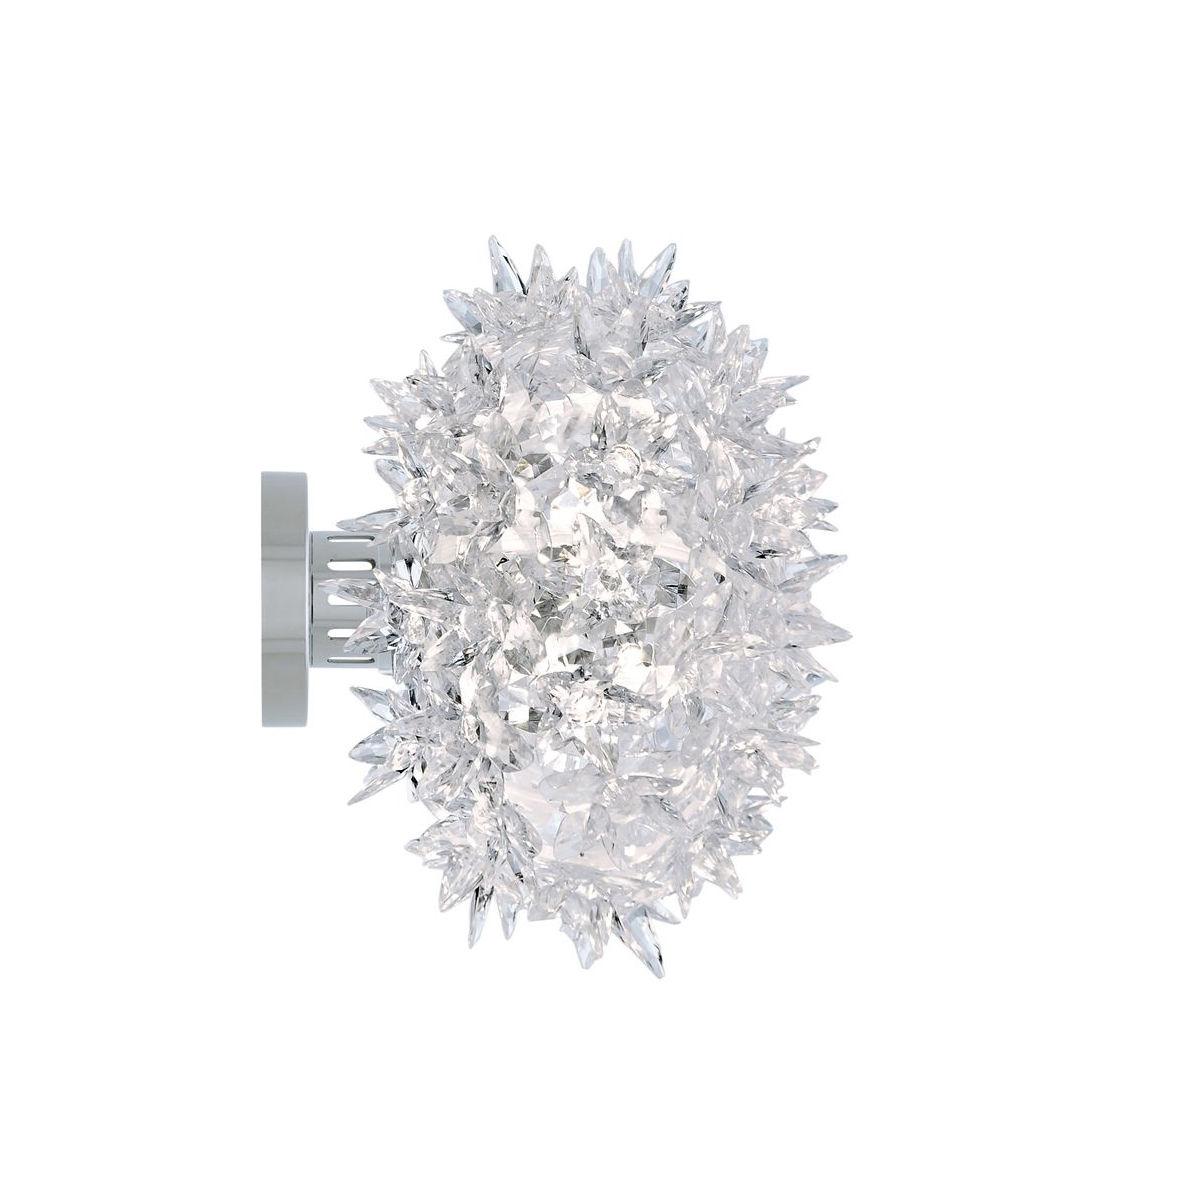 Bloom wandlamp Kartell kristal